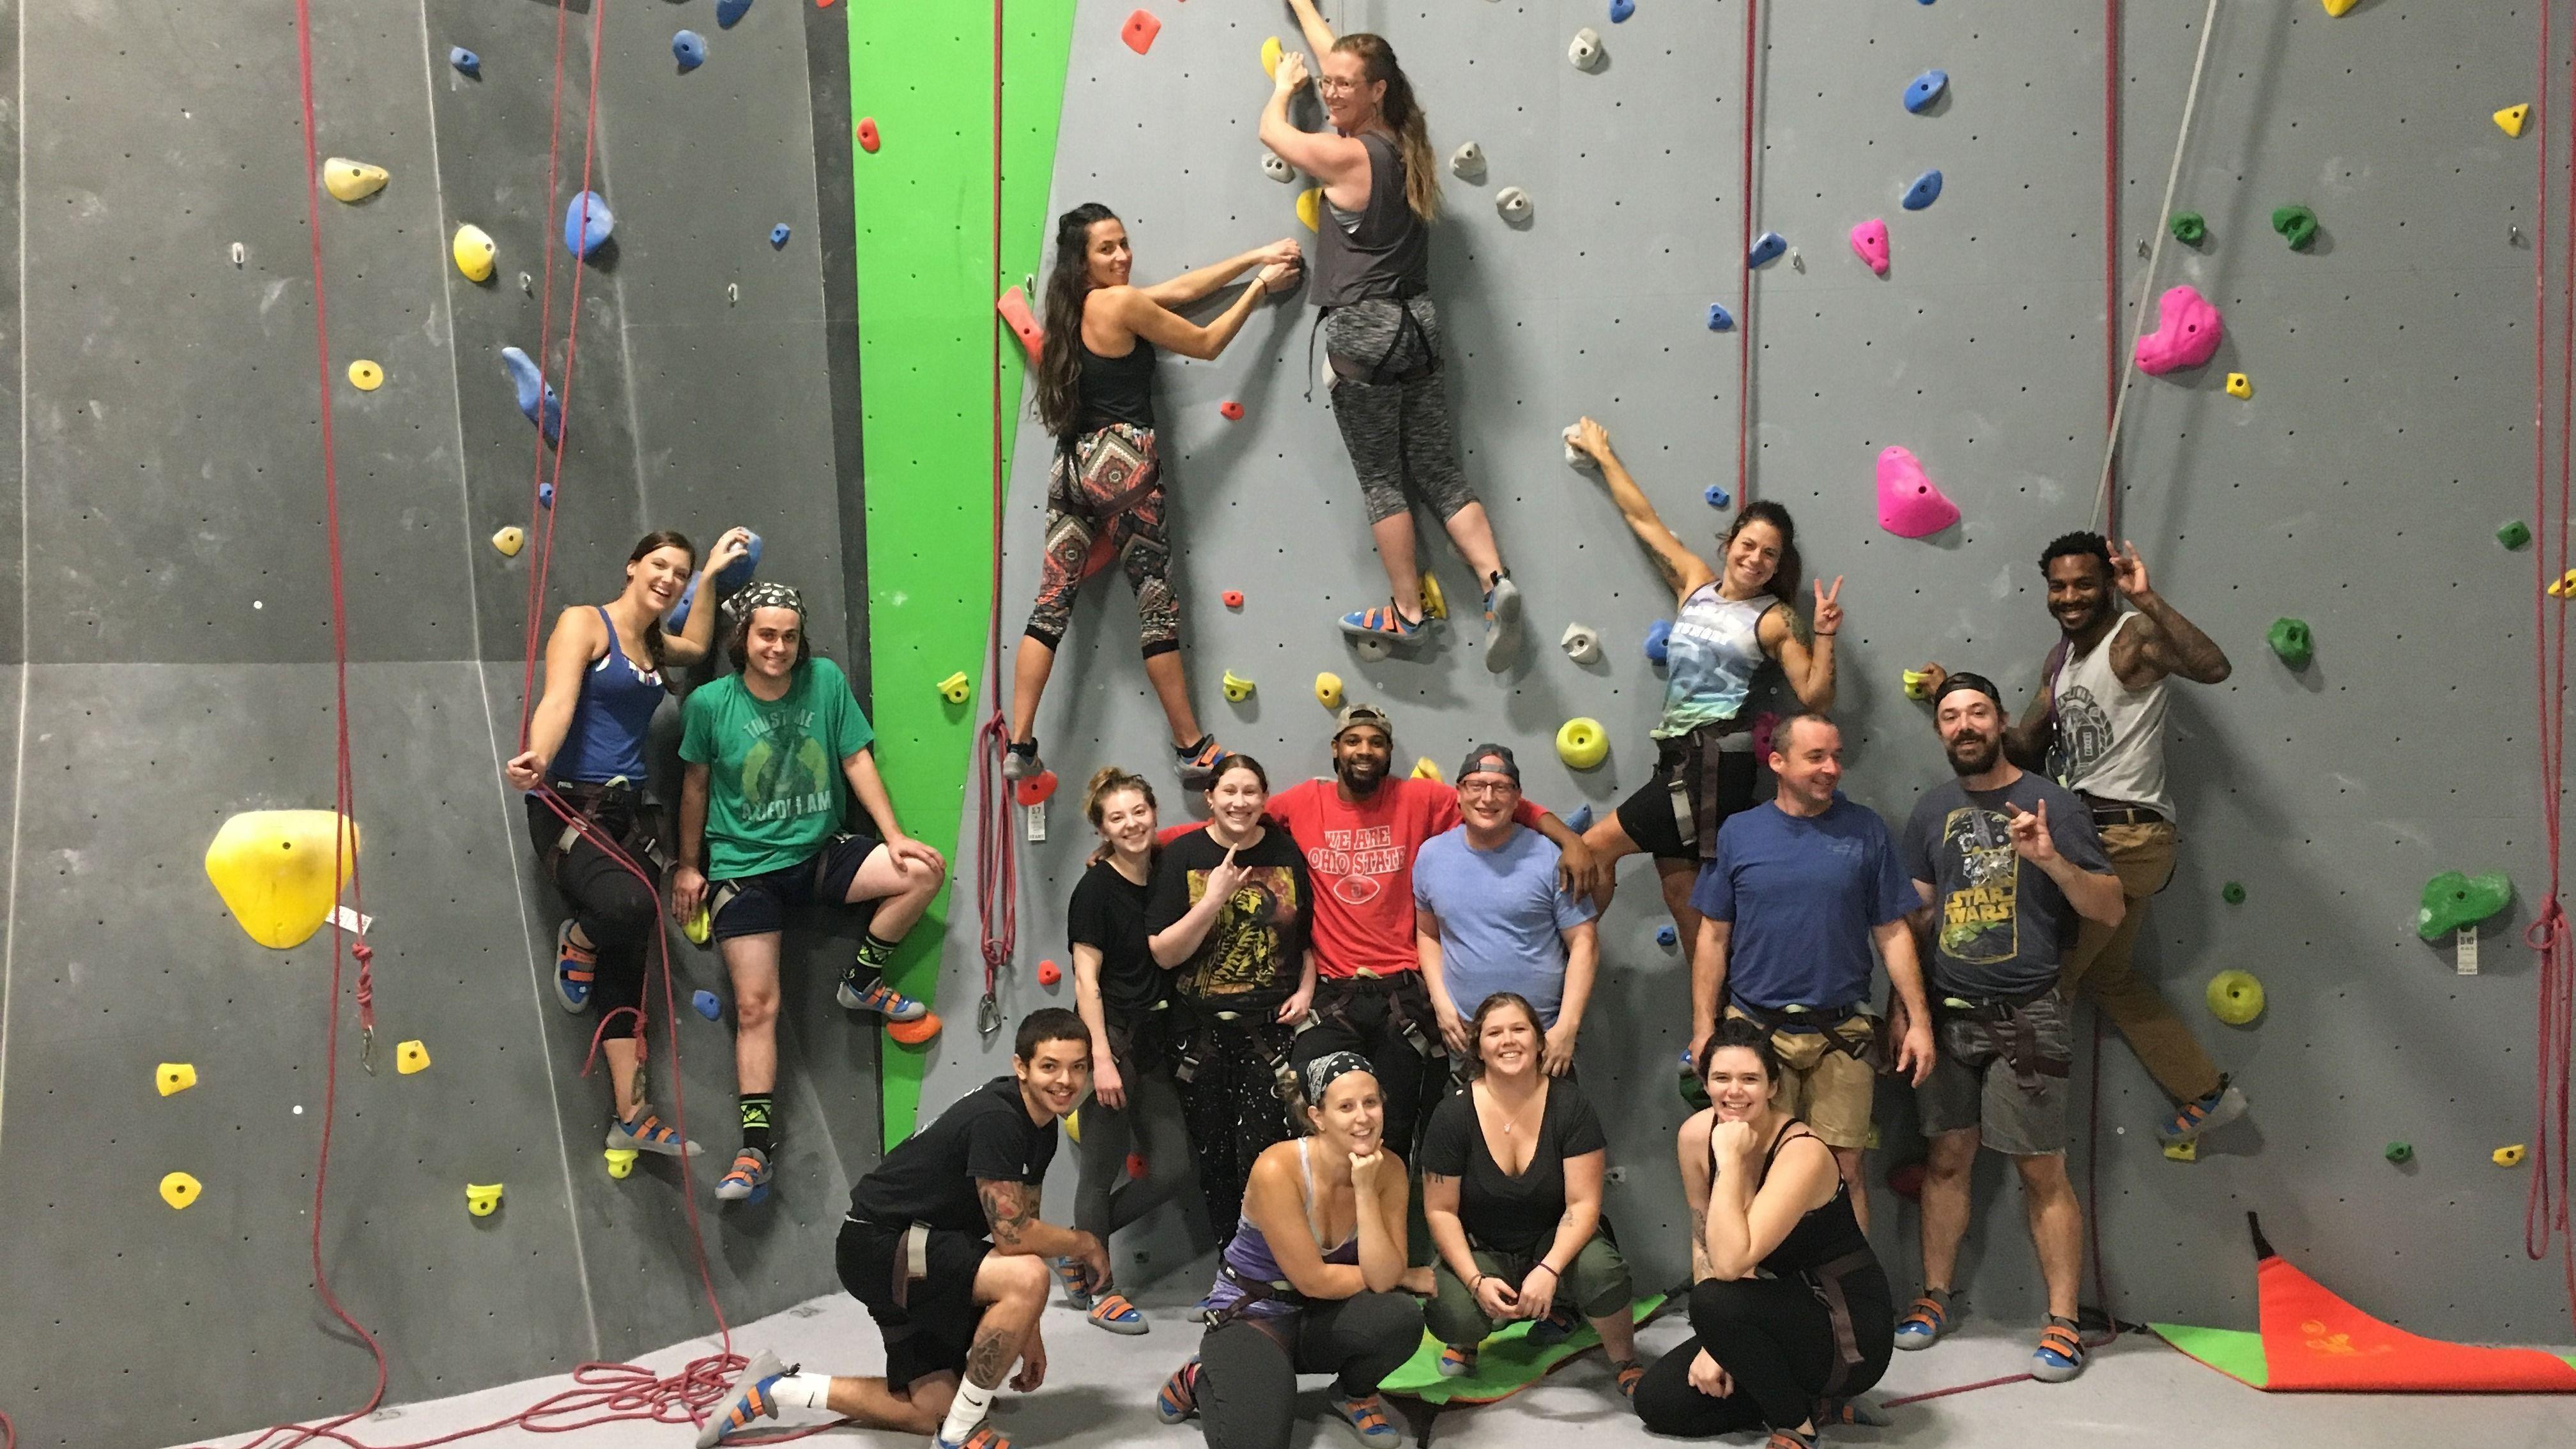 TRC RVA Climbing Meetup